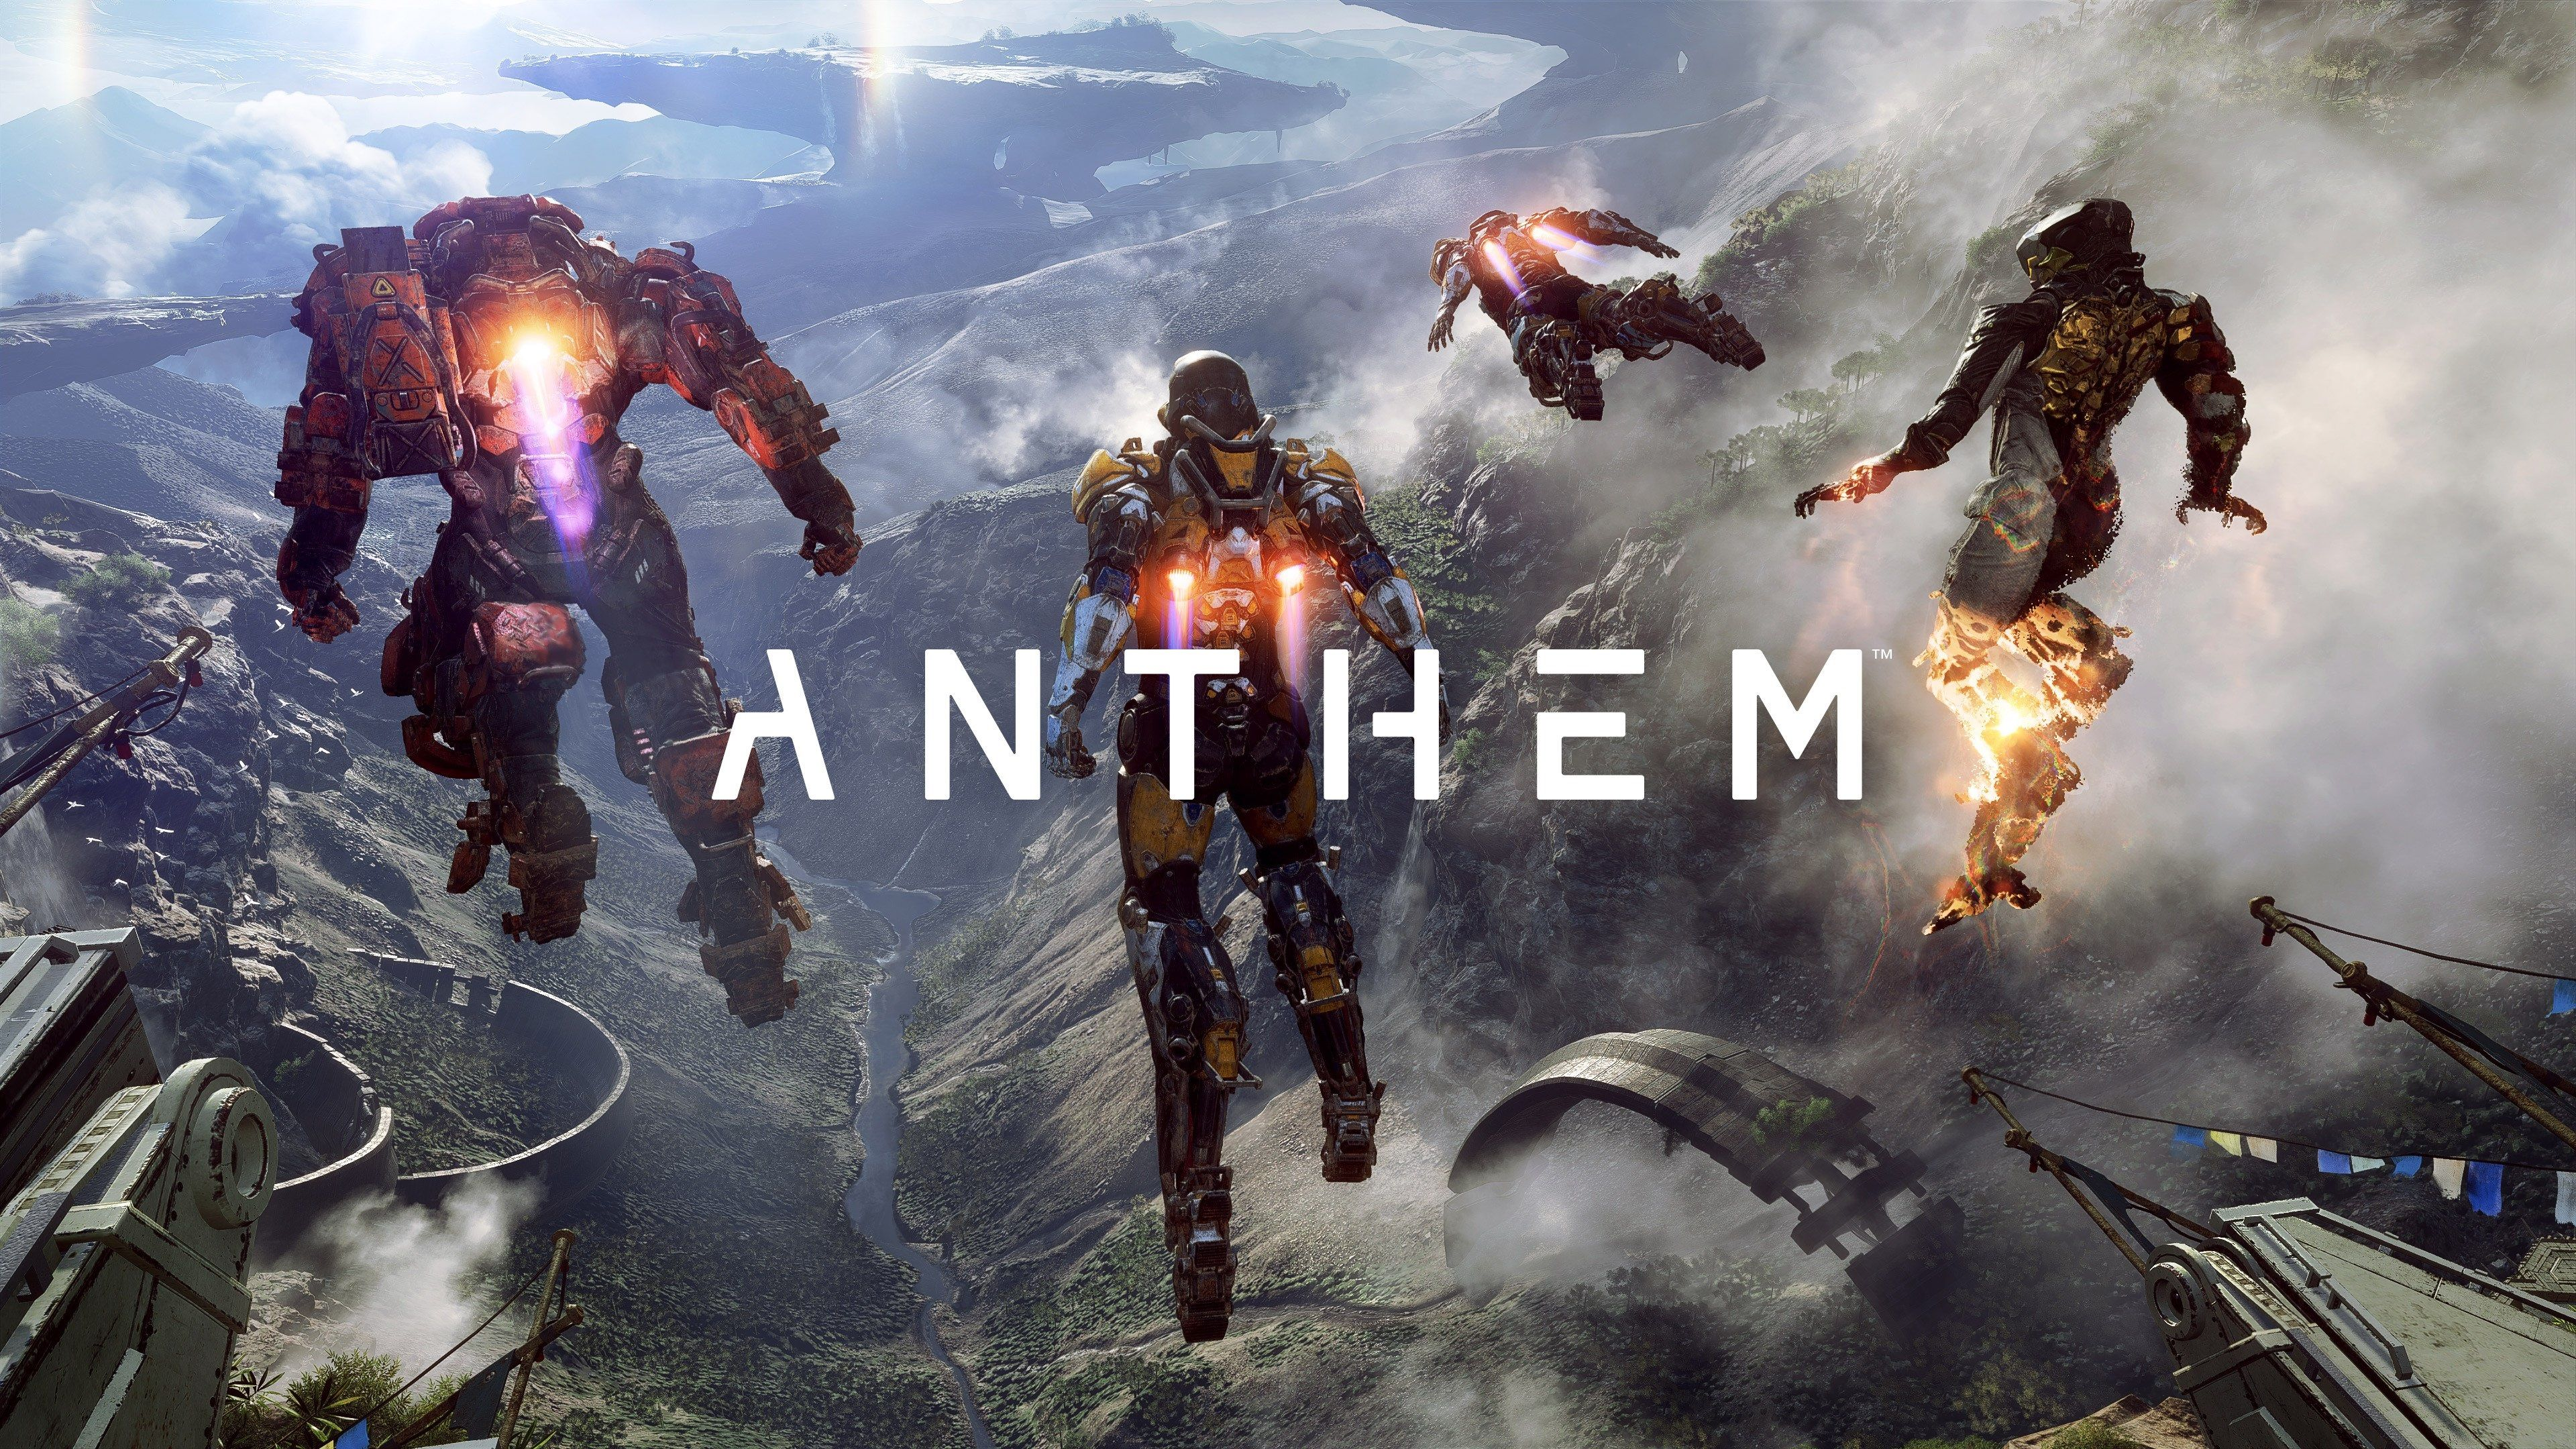 3840x2160 anthem 4k hd wallpaper download for pc Anthem